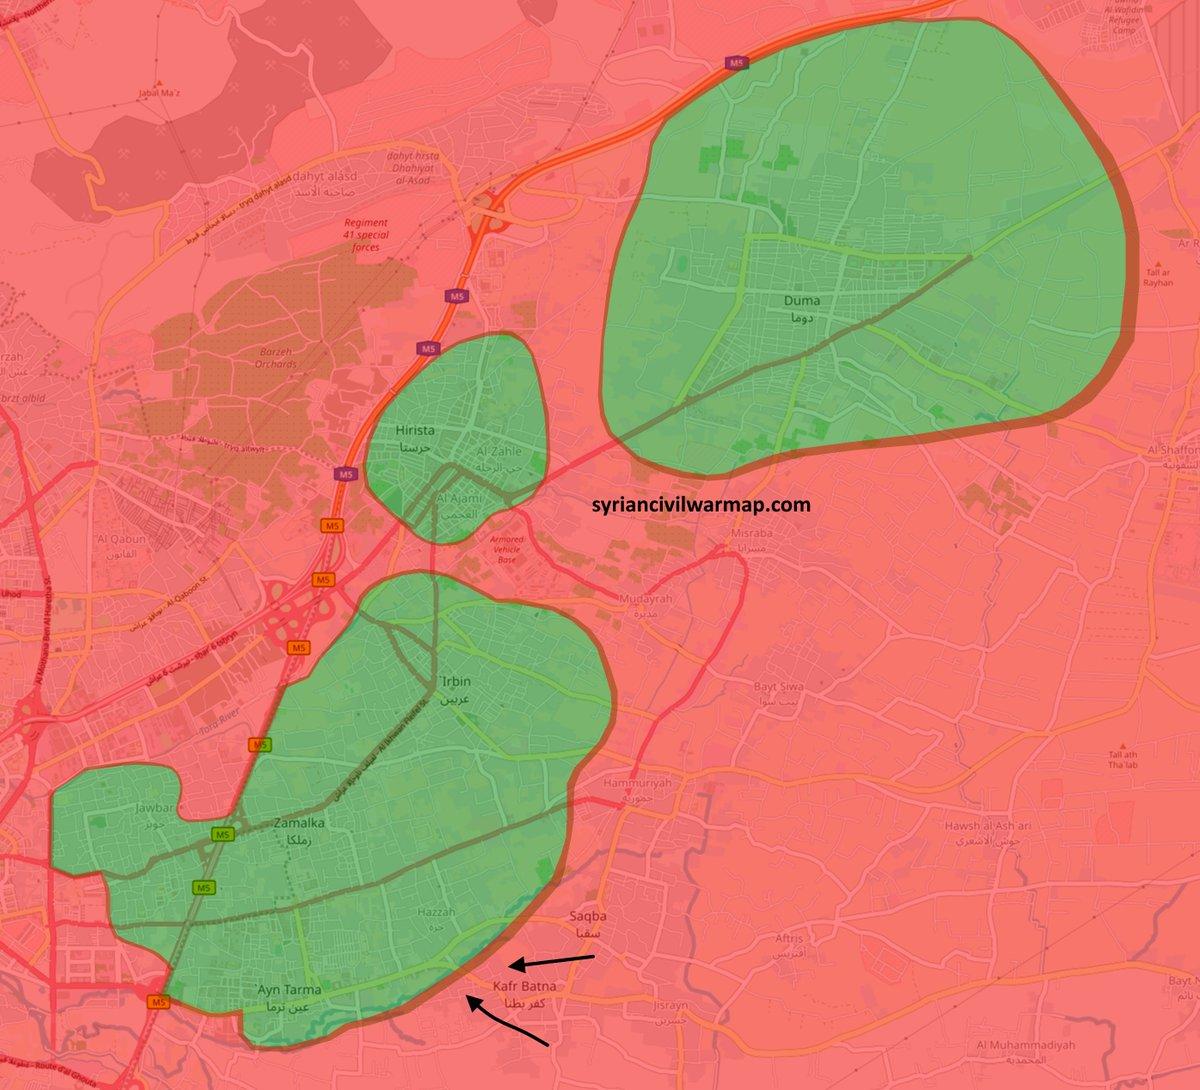 Syrian Civil War Map on Twitter: \